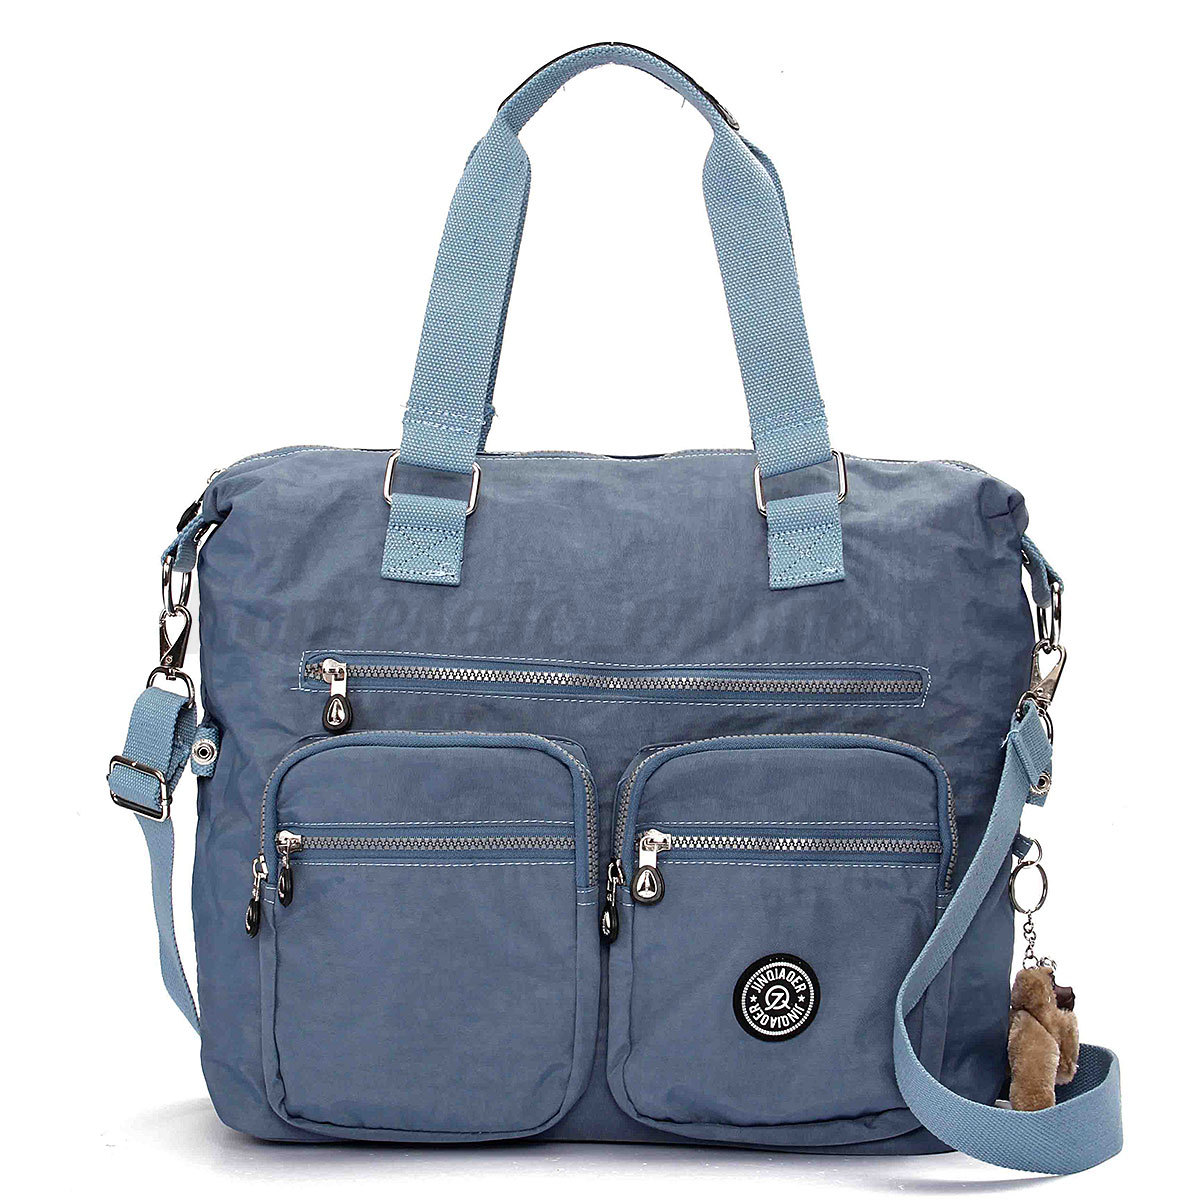 Fantastic Womens Leather Purse Multiple ID Pocket Crossbody Organizer Messenger Travel Bag | EBay